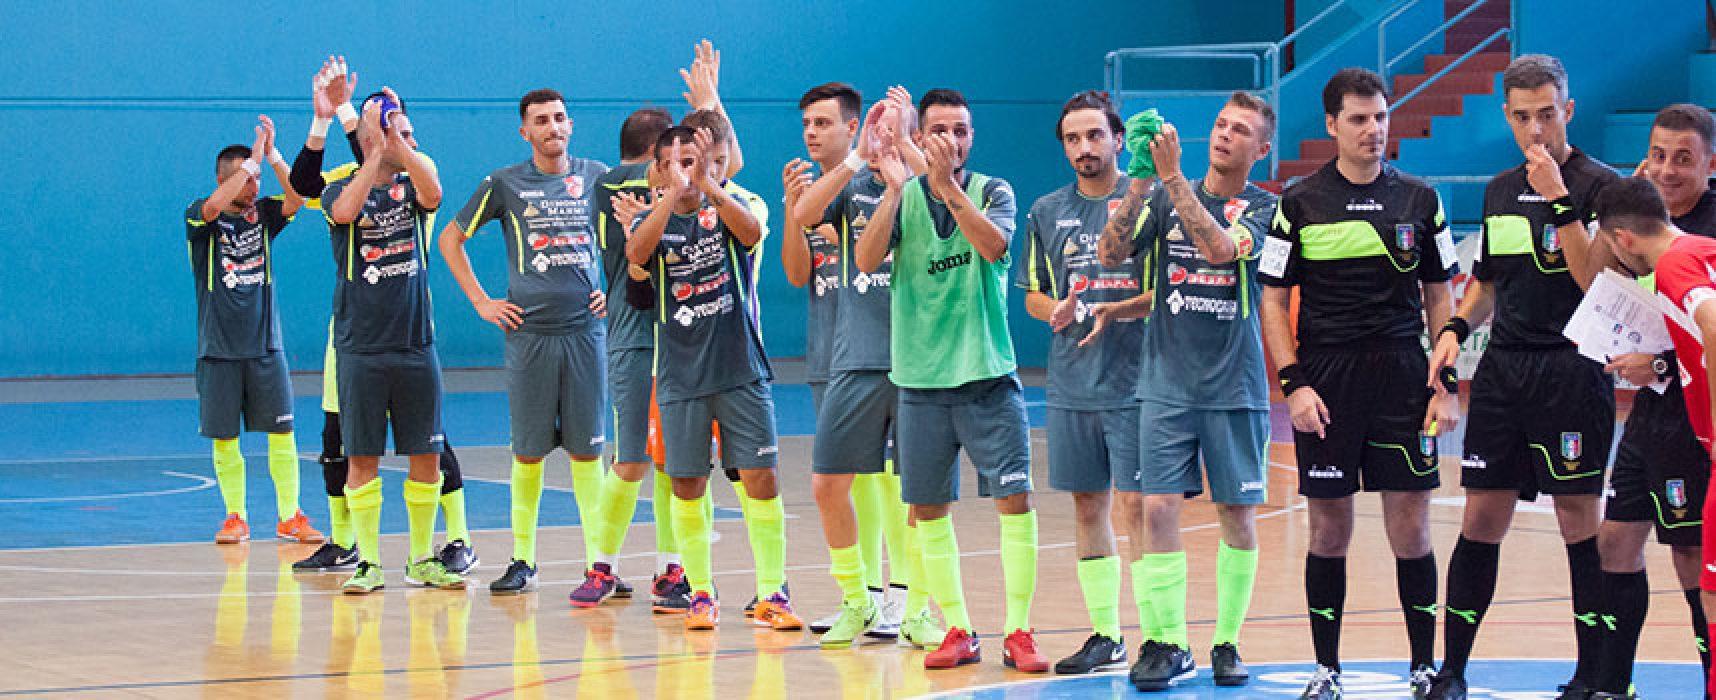 Diaz sconfitta in Coppa Italia dal Futsal Altamura